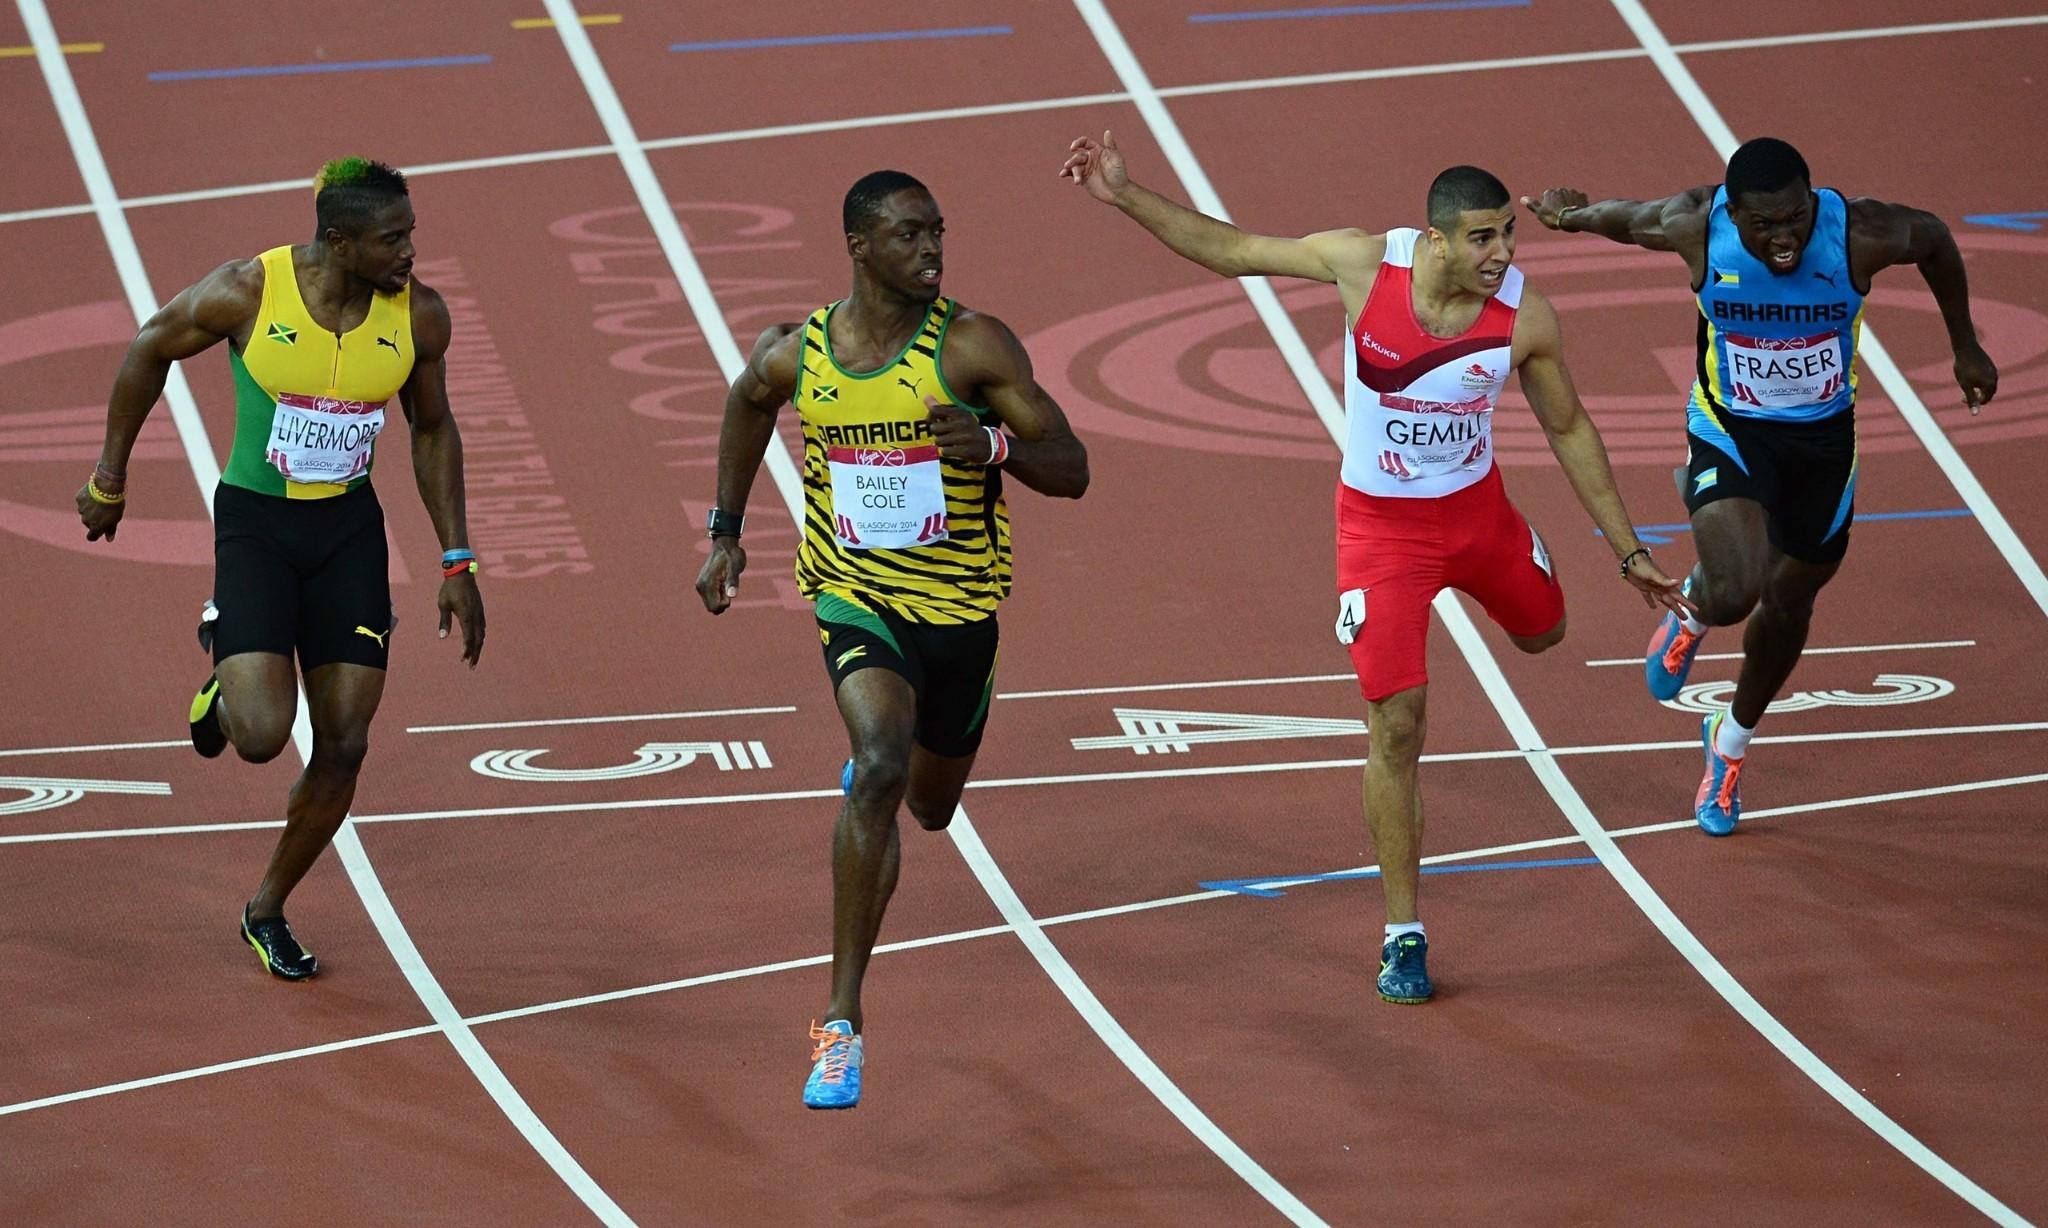 Commonwealth Games: Adam Gemili wins 100m silver behind Bailey-Cole